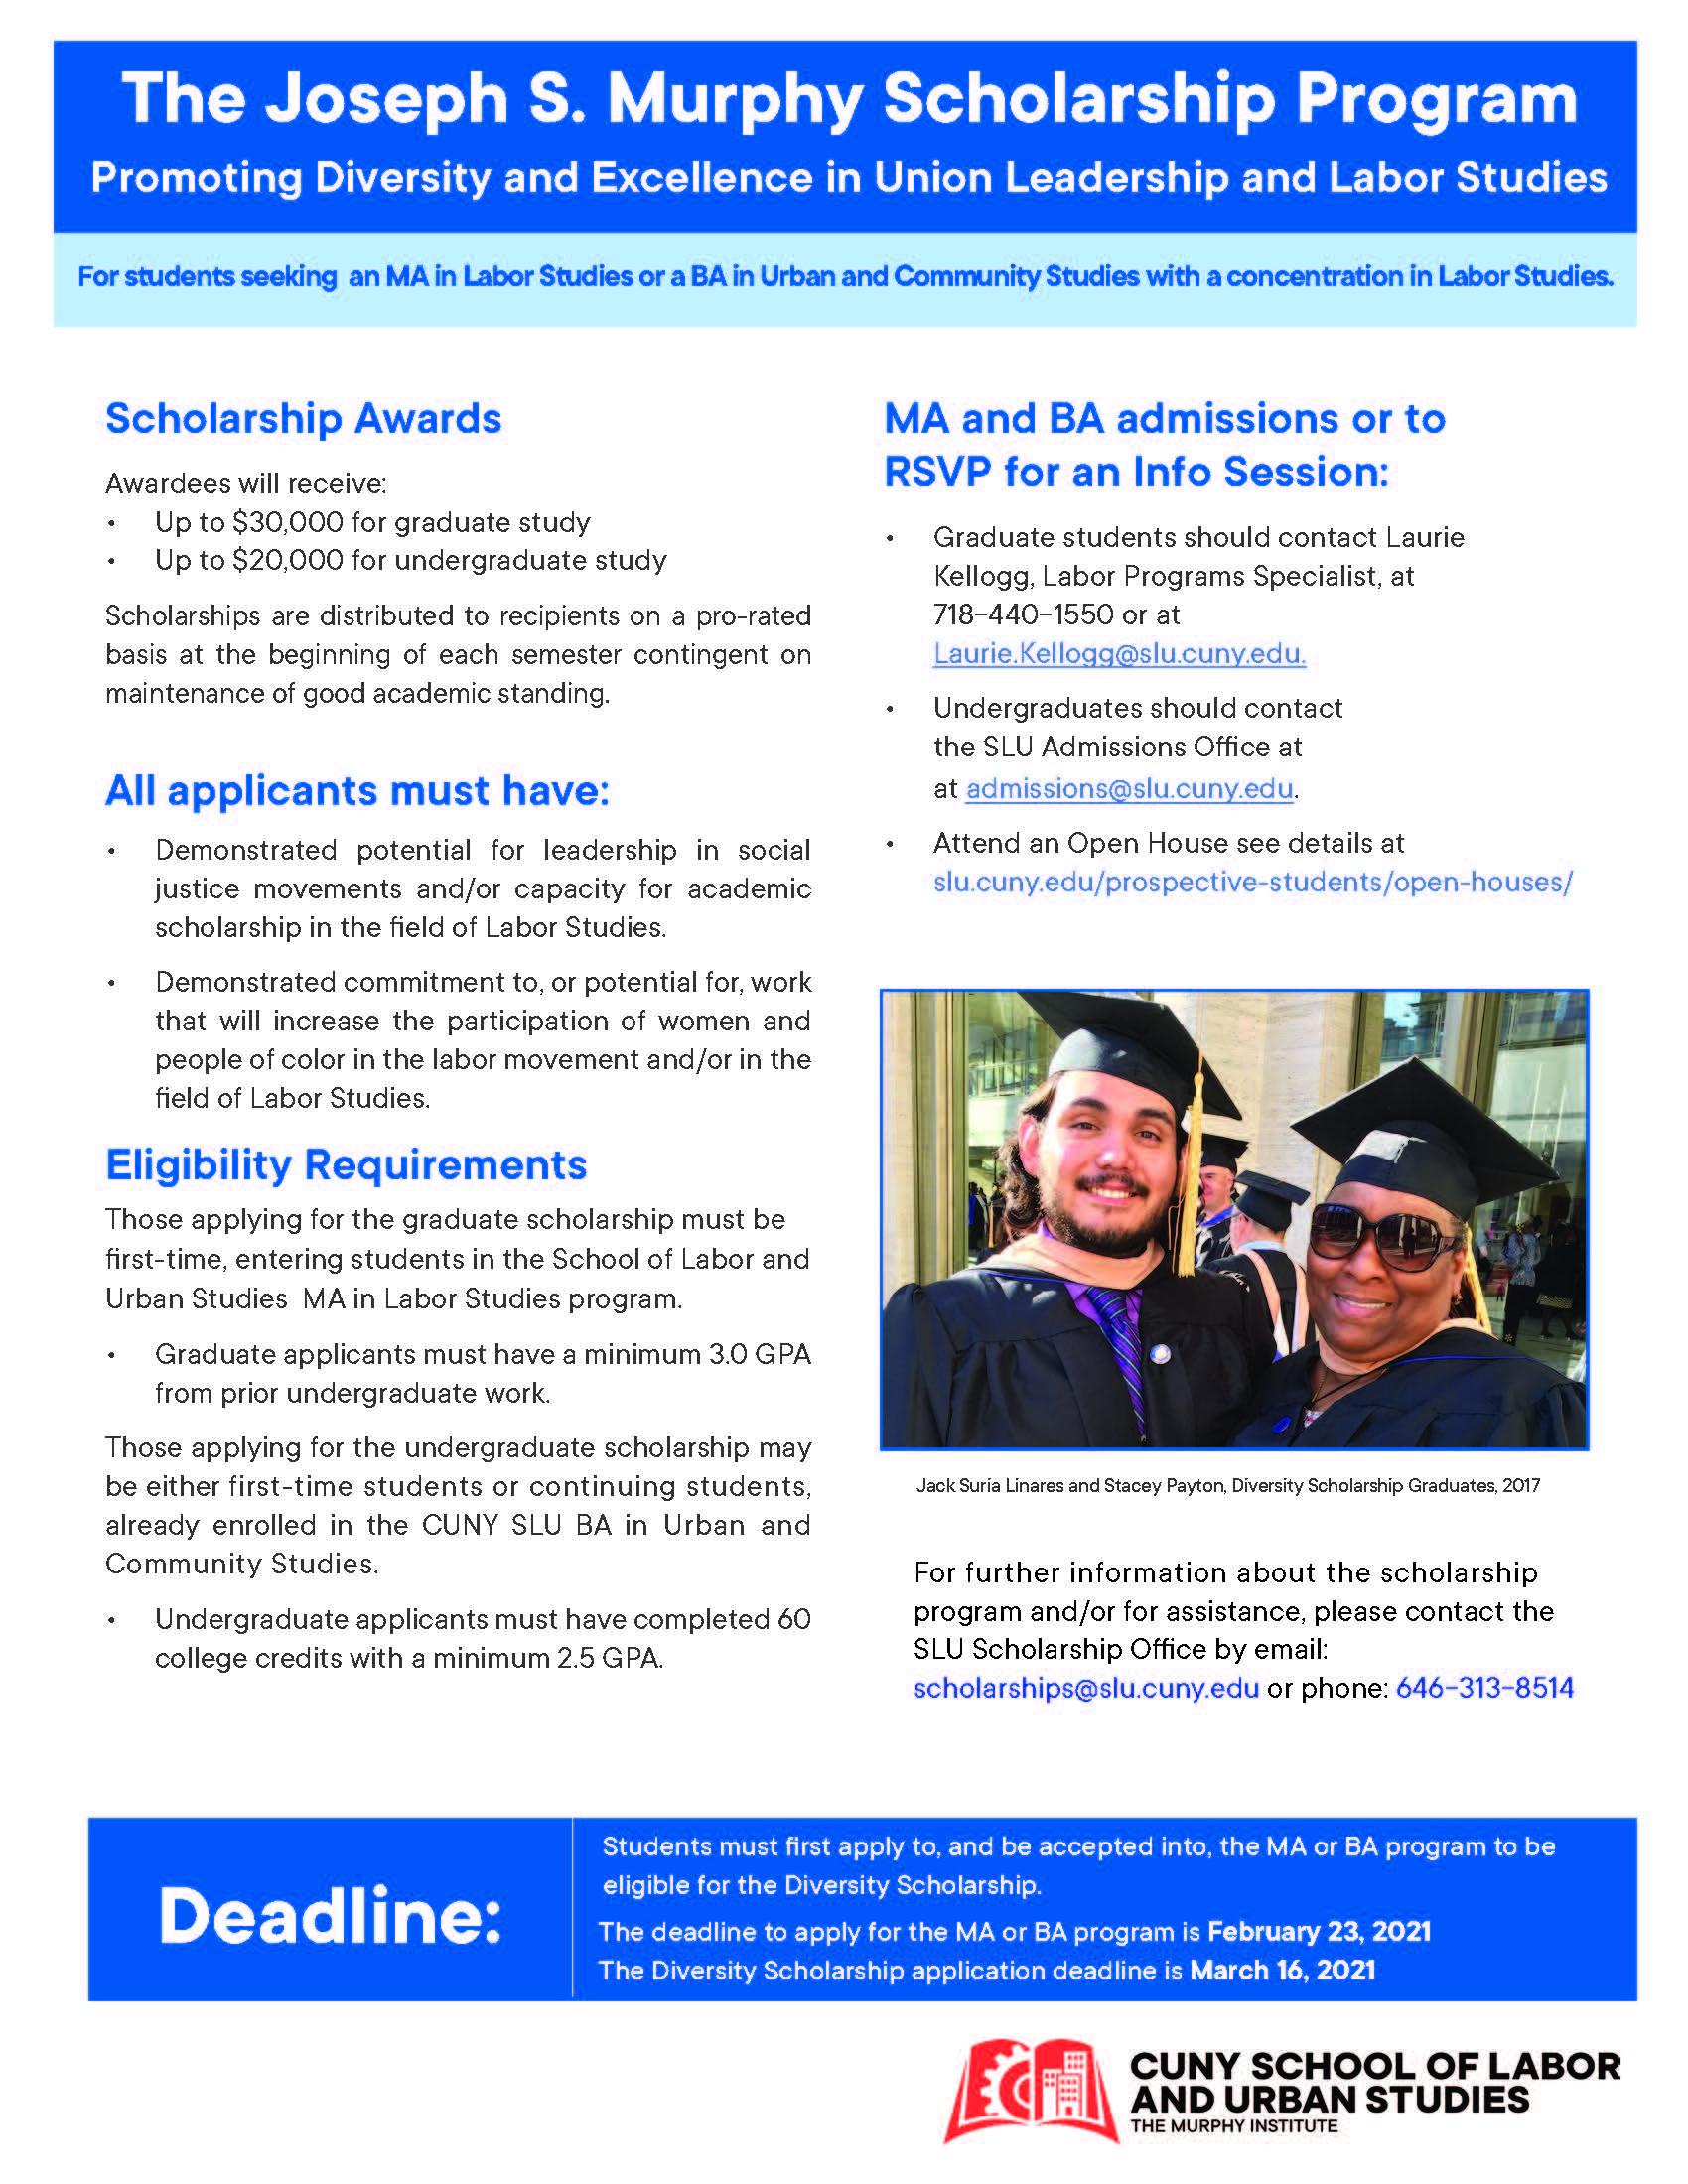 Diversity Scholarship for CUNY/SLU